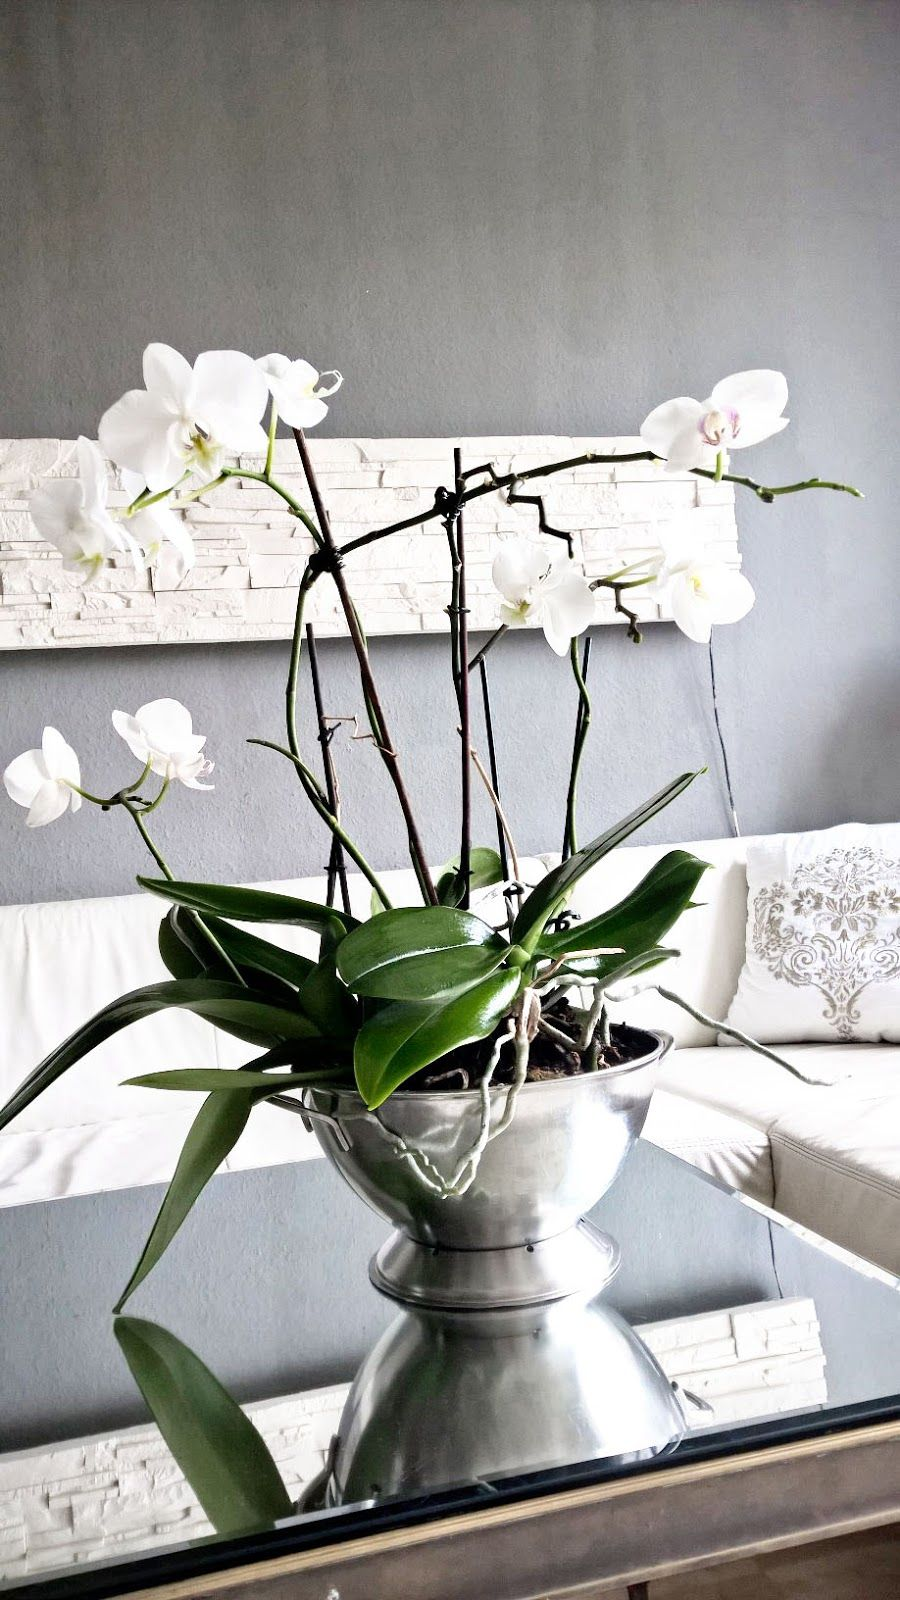 orchideen wohnzimmer elegant gestalten organisation pinterest orchideen haushaltstipps. Black Bedroom Furniture Sets. Home Design Ideas